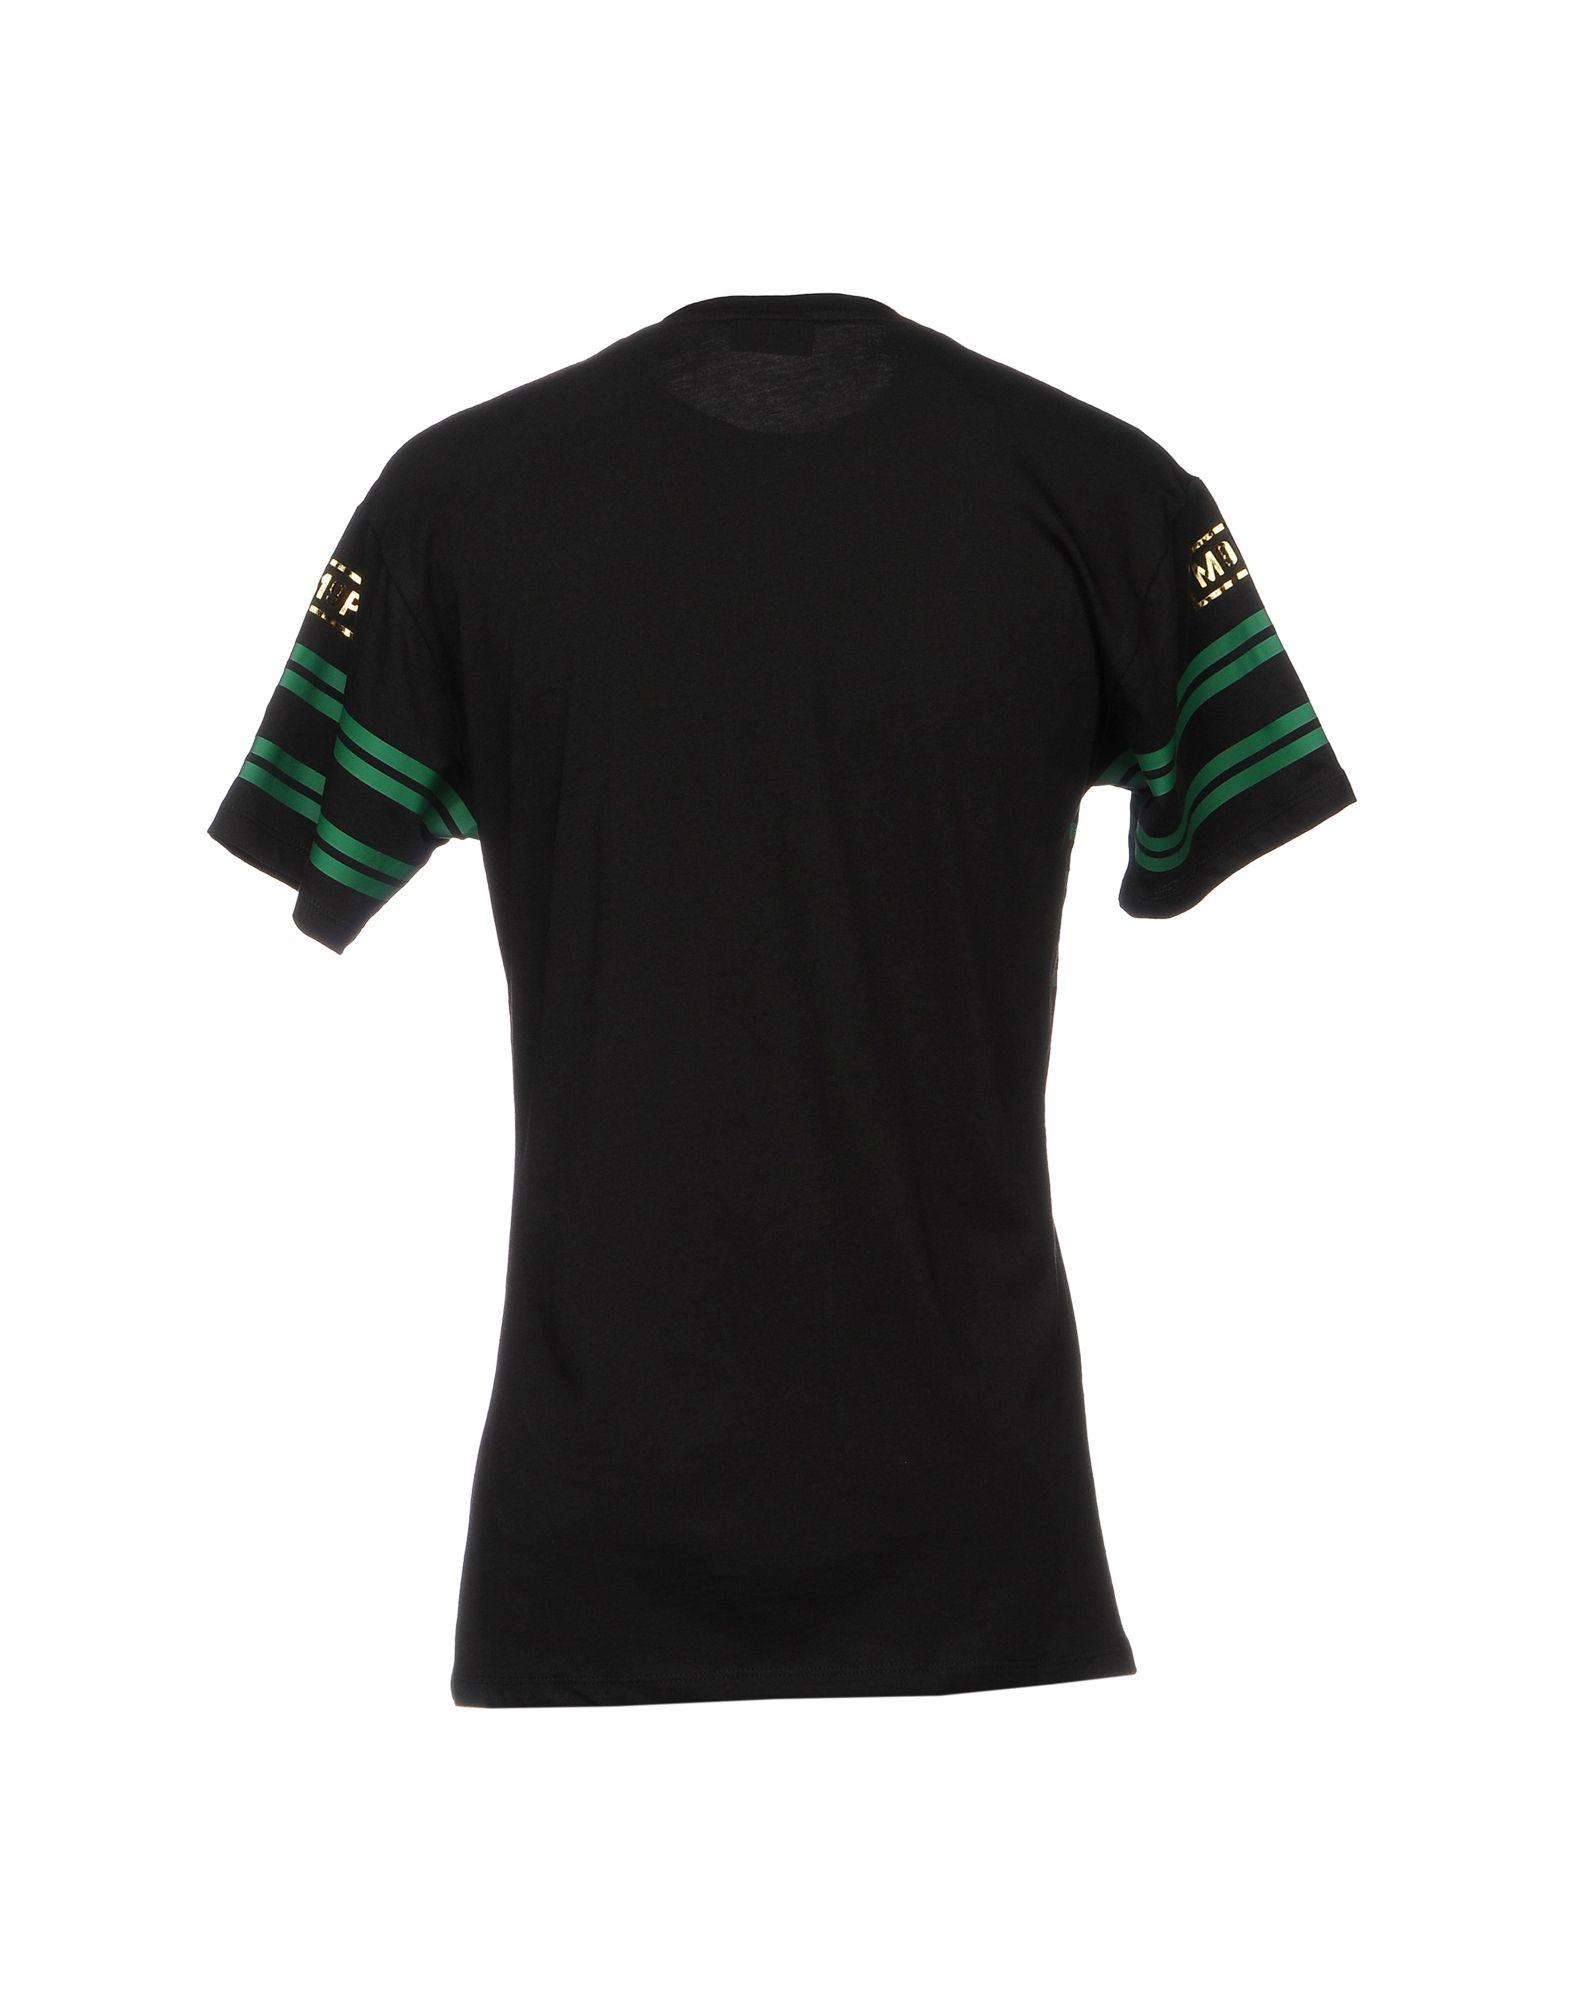 T-Shirt Maison 12078731RB 9 Paris Uomo - 12078731RB Maison f6cc45